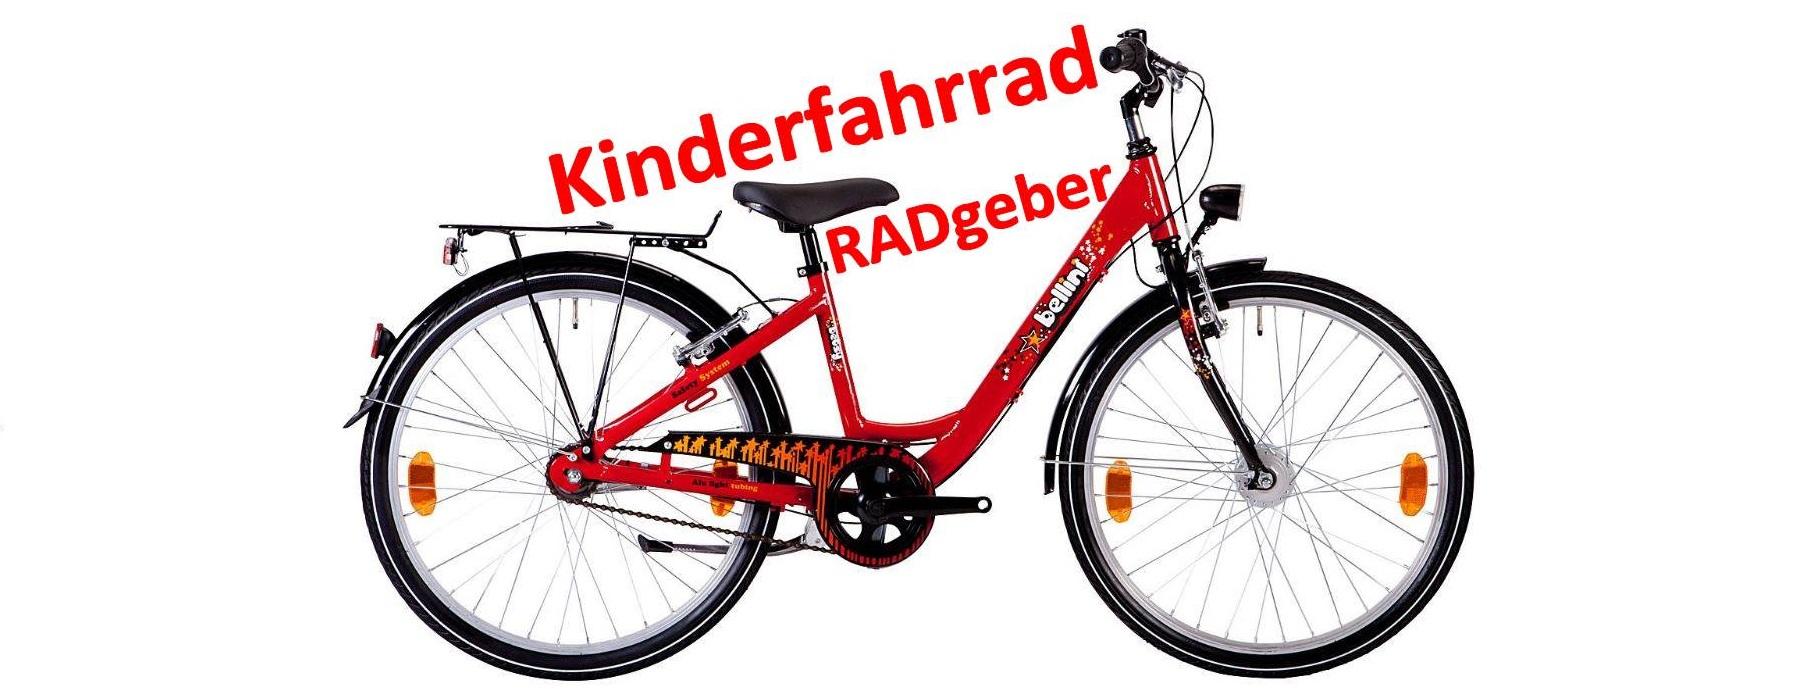 Kinderfahrrad Ratgeber © Fahrrad XXL